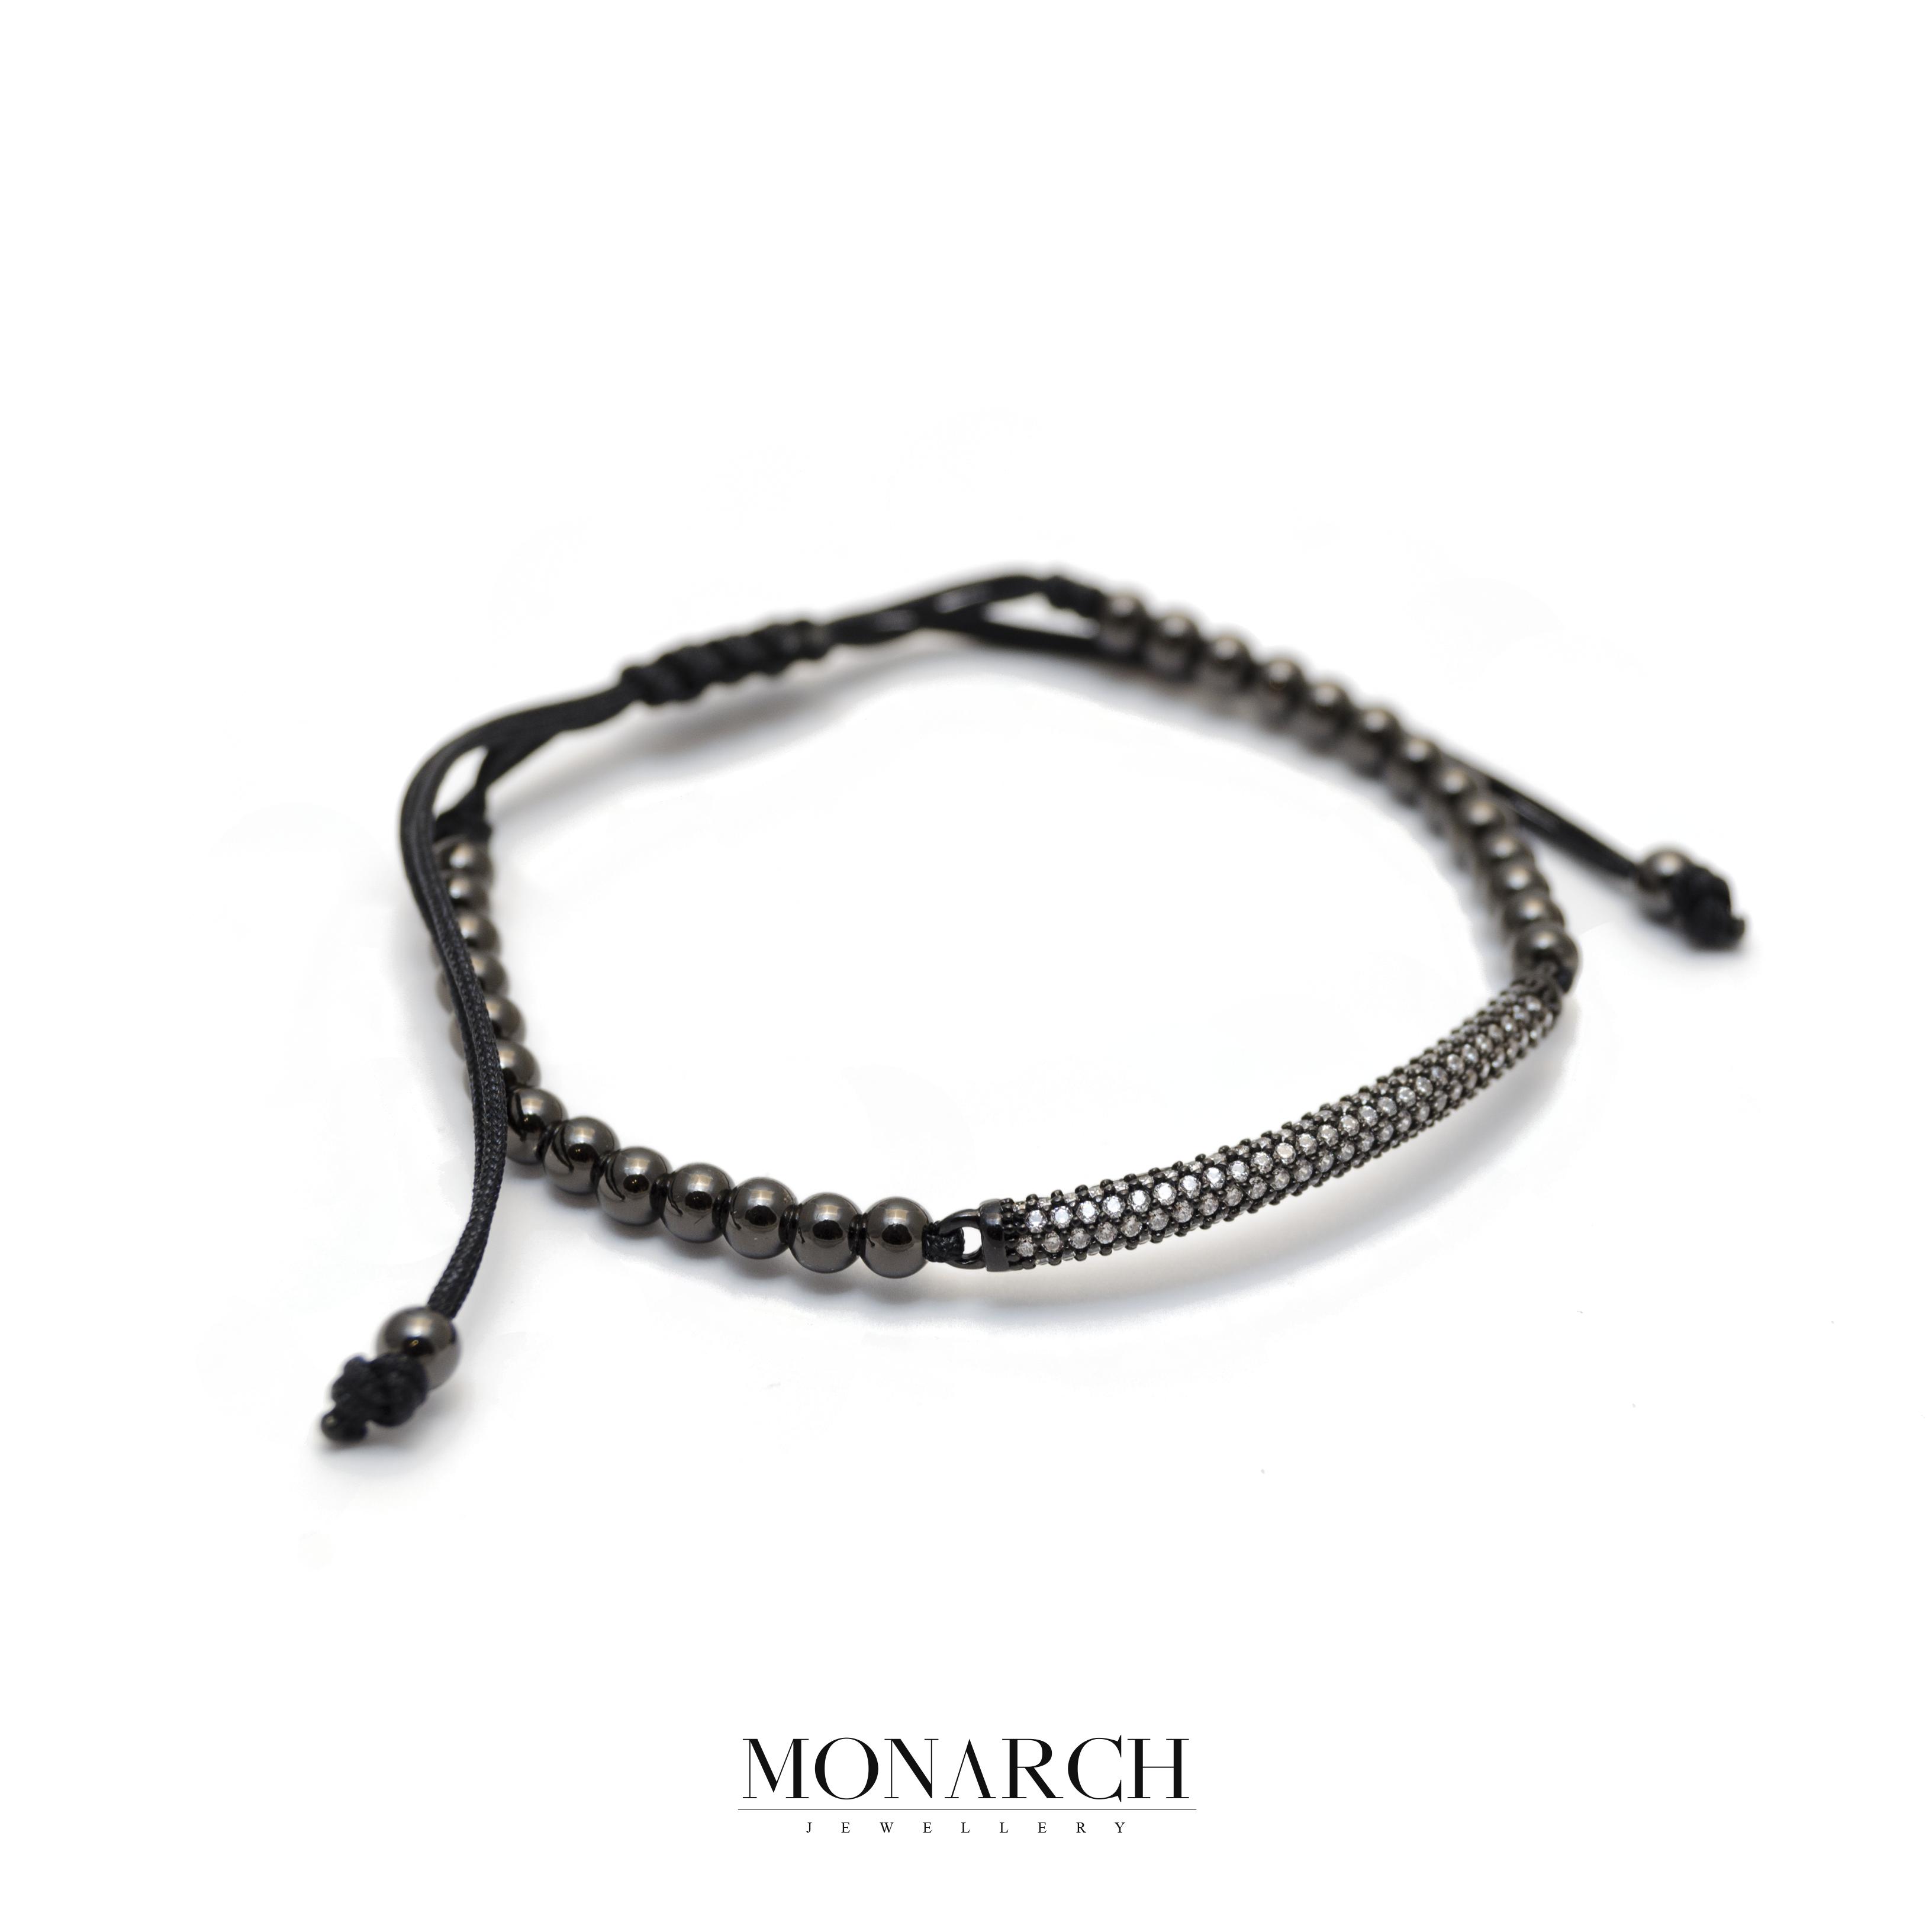 Monarch Jewellery Bratara Luxury Black White Micro Pave Charm